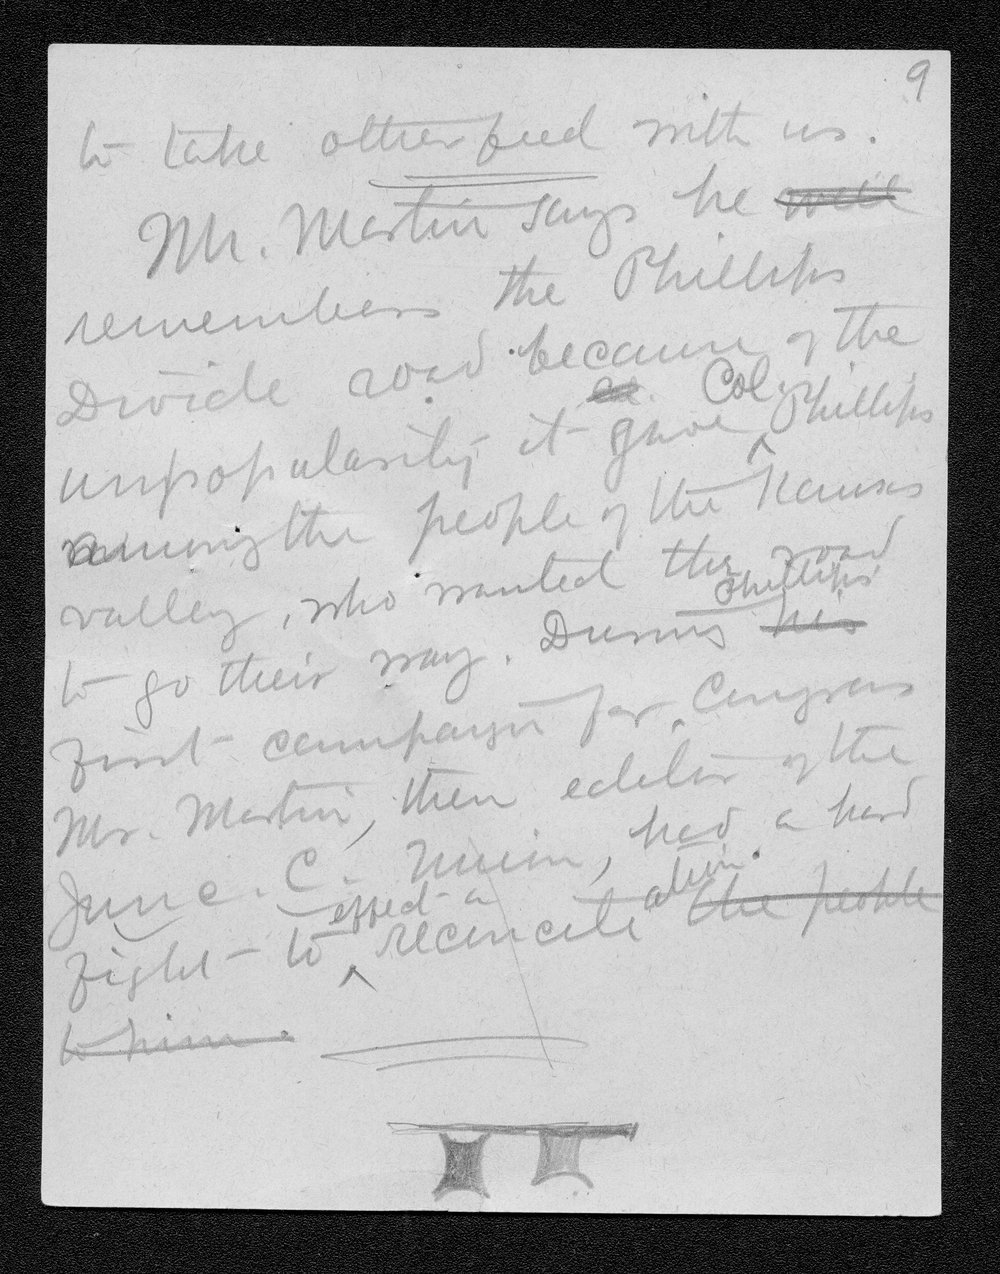 Trails correspondence - 10